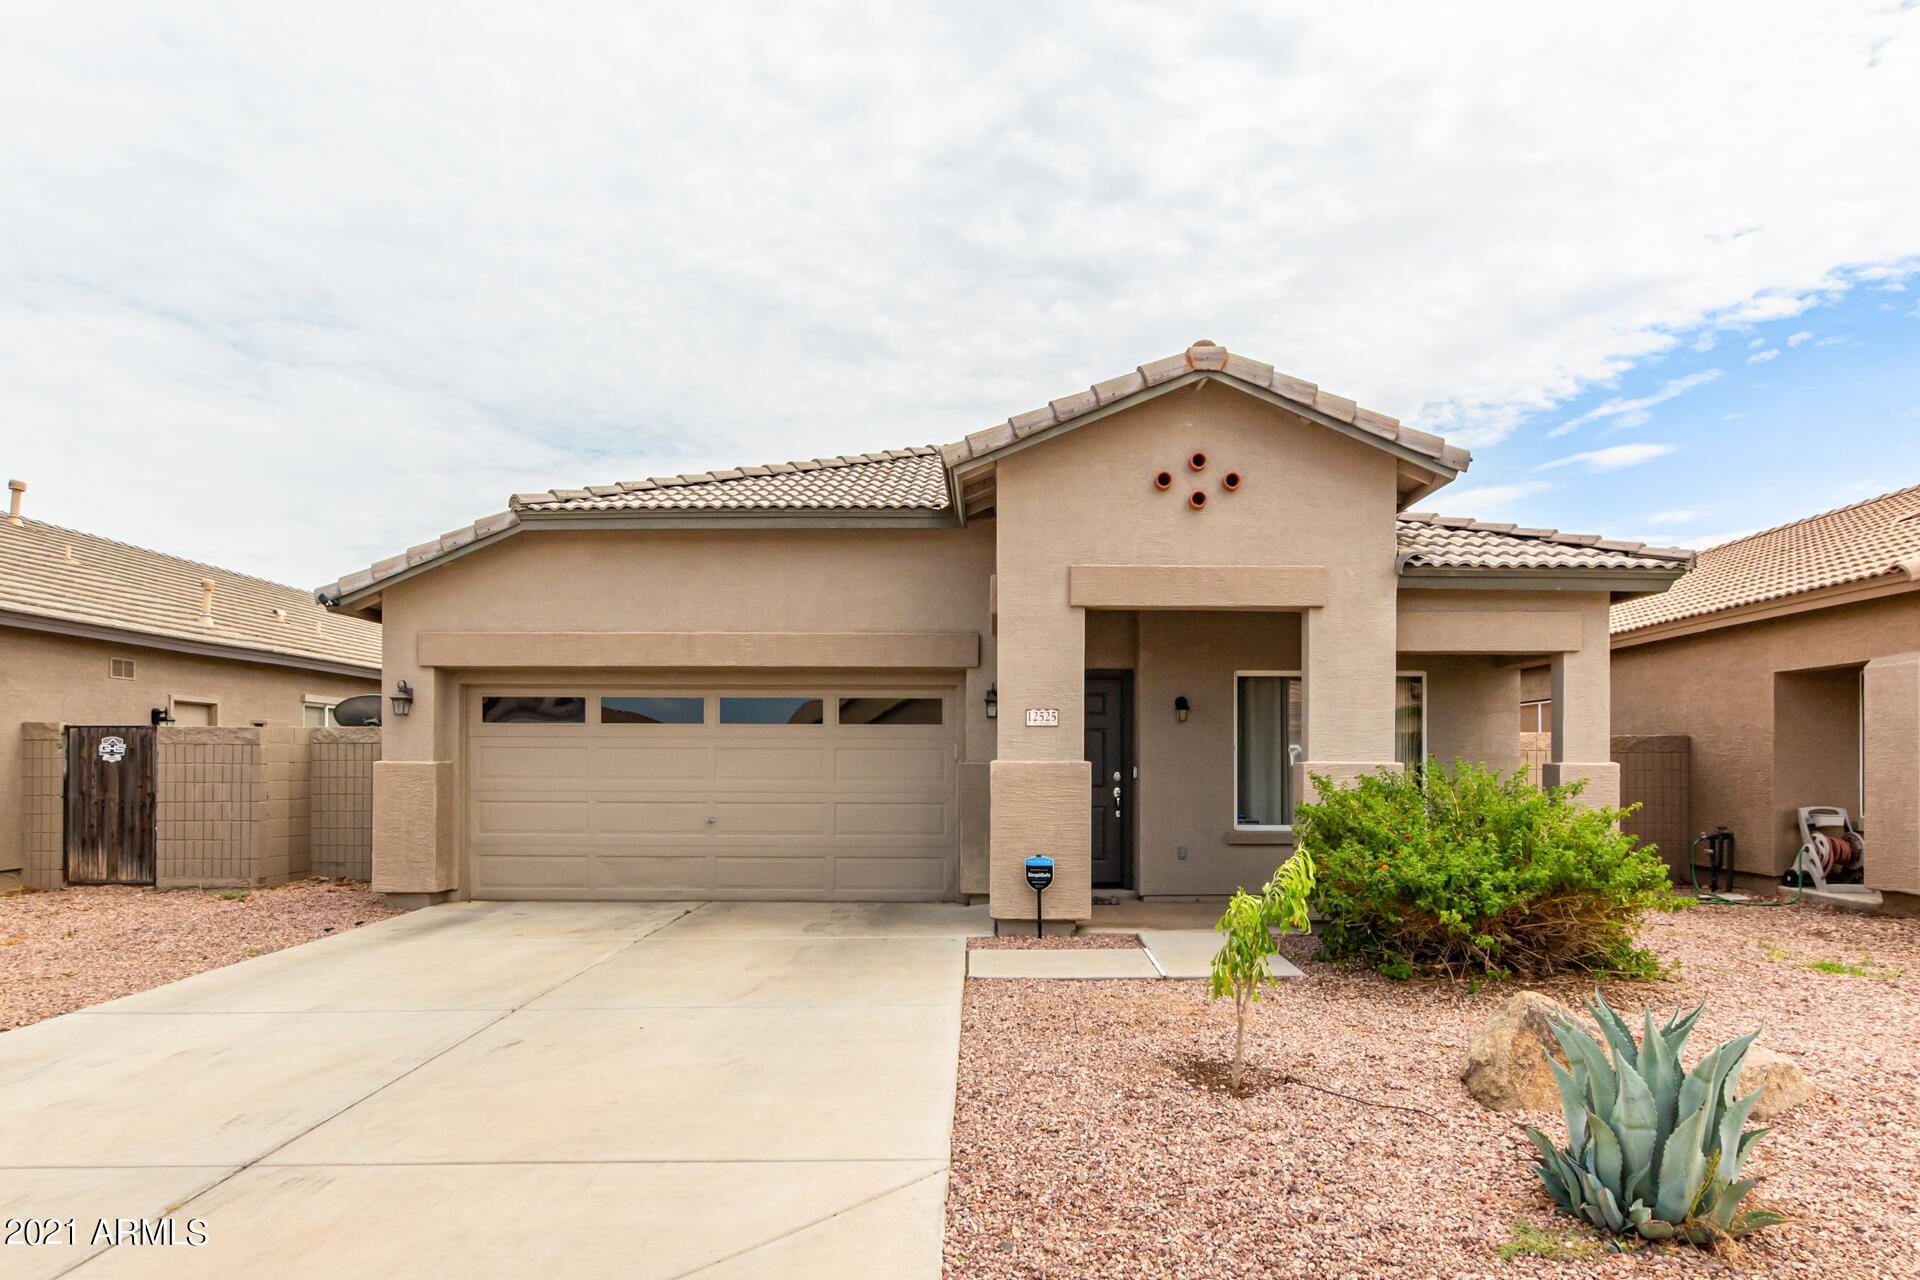 12525 W JEFFERSON Street, Avondale, AZ 85323 - MLS#: 6270496